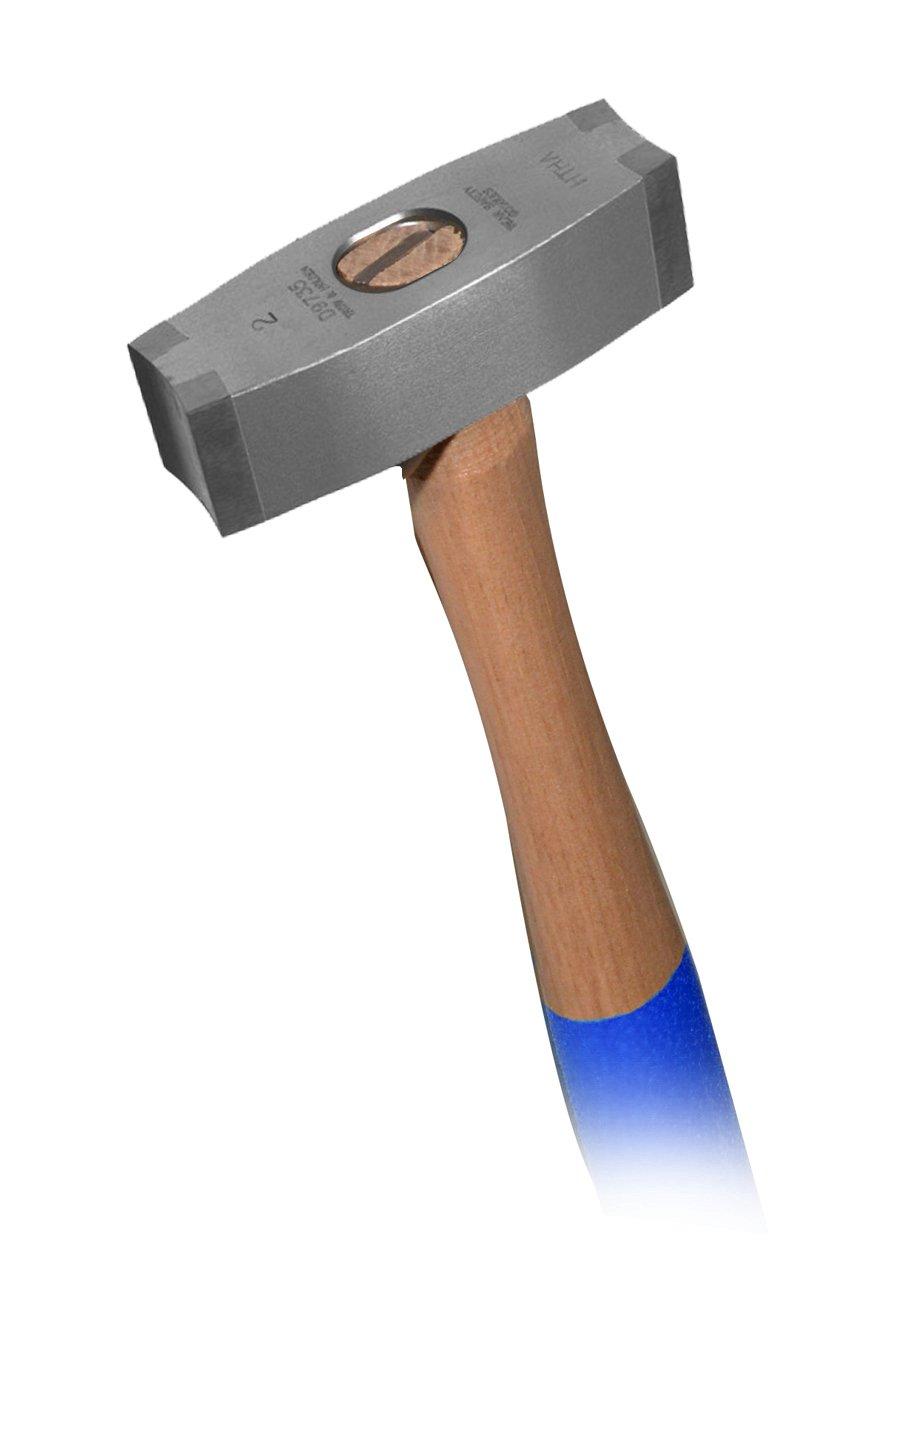 Bon 21-256 2-1/2-Pound Carbide Stone Trimming Hammer